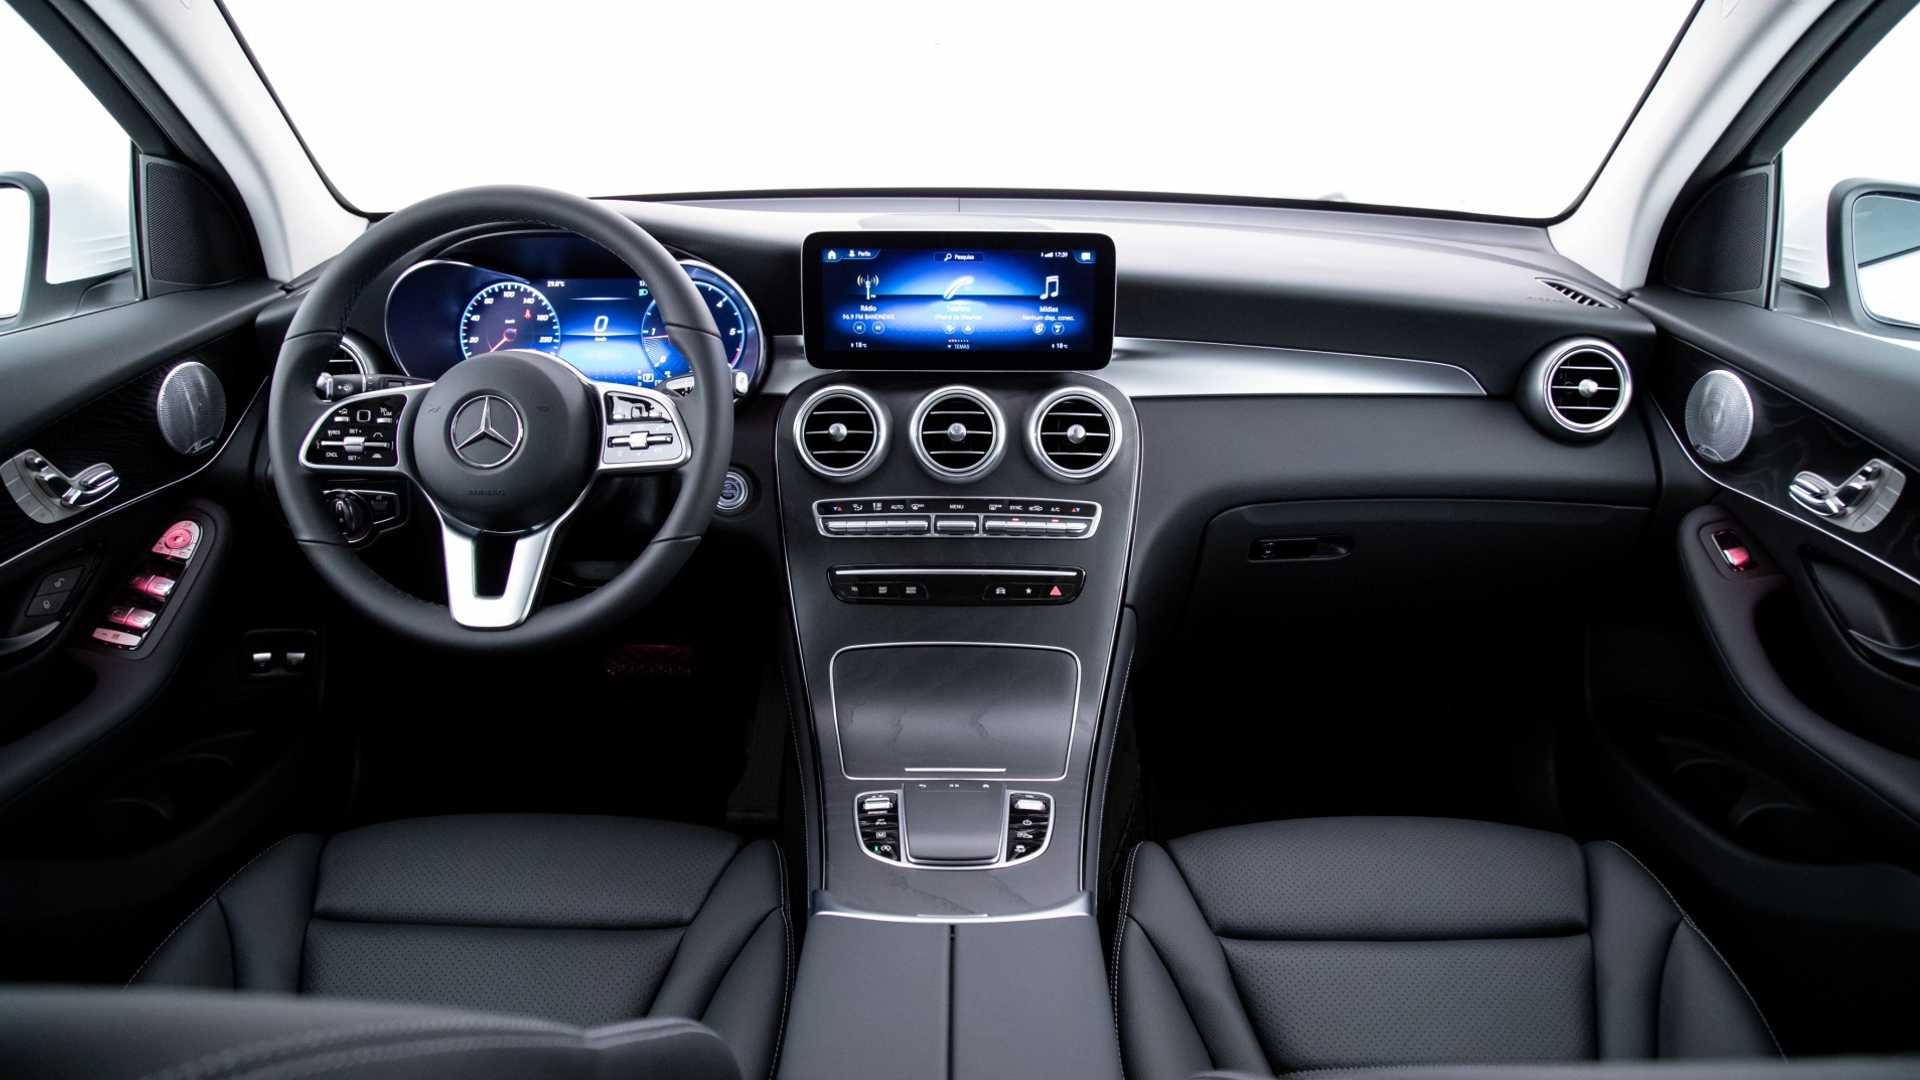 Mercedes GLC 220 d 4Matic 2020